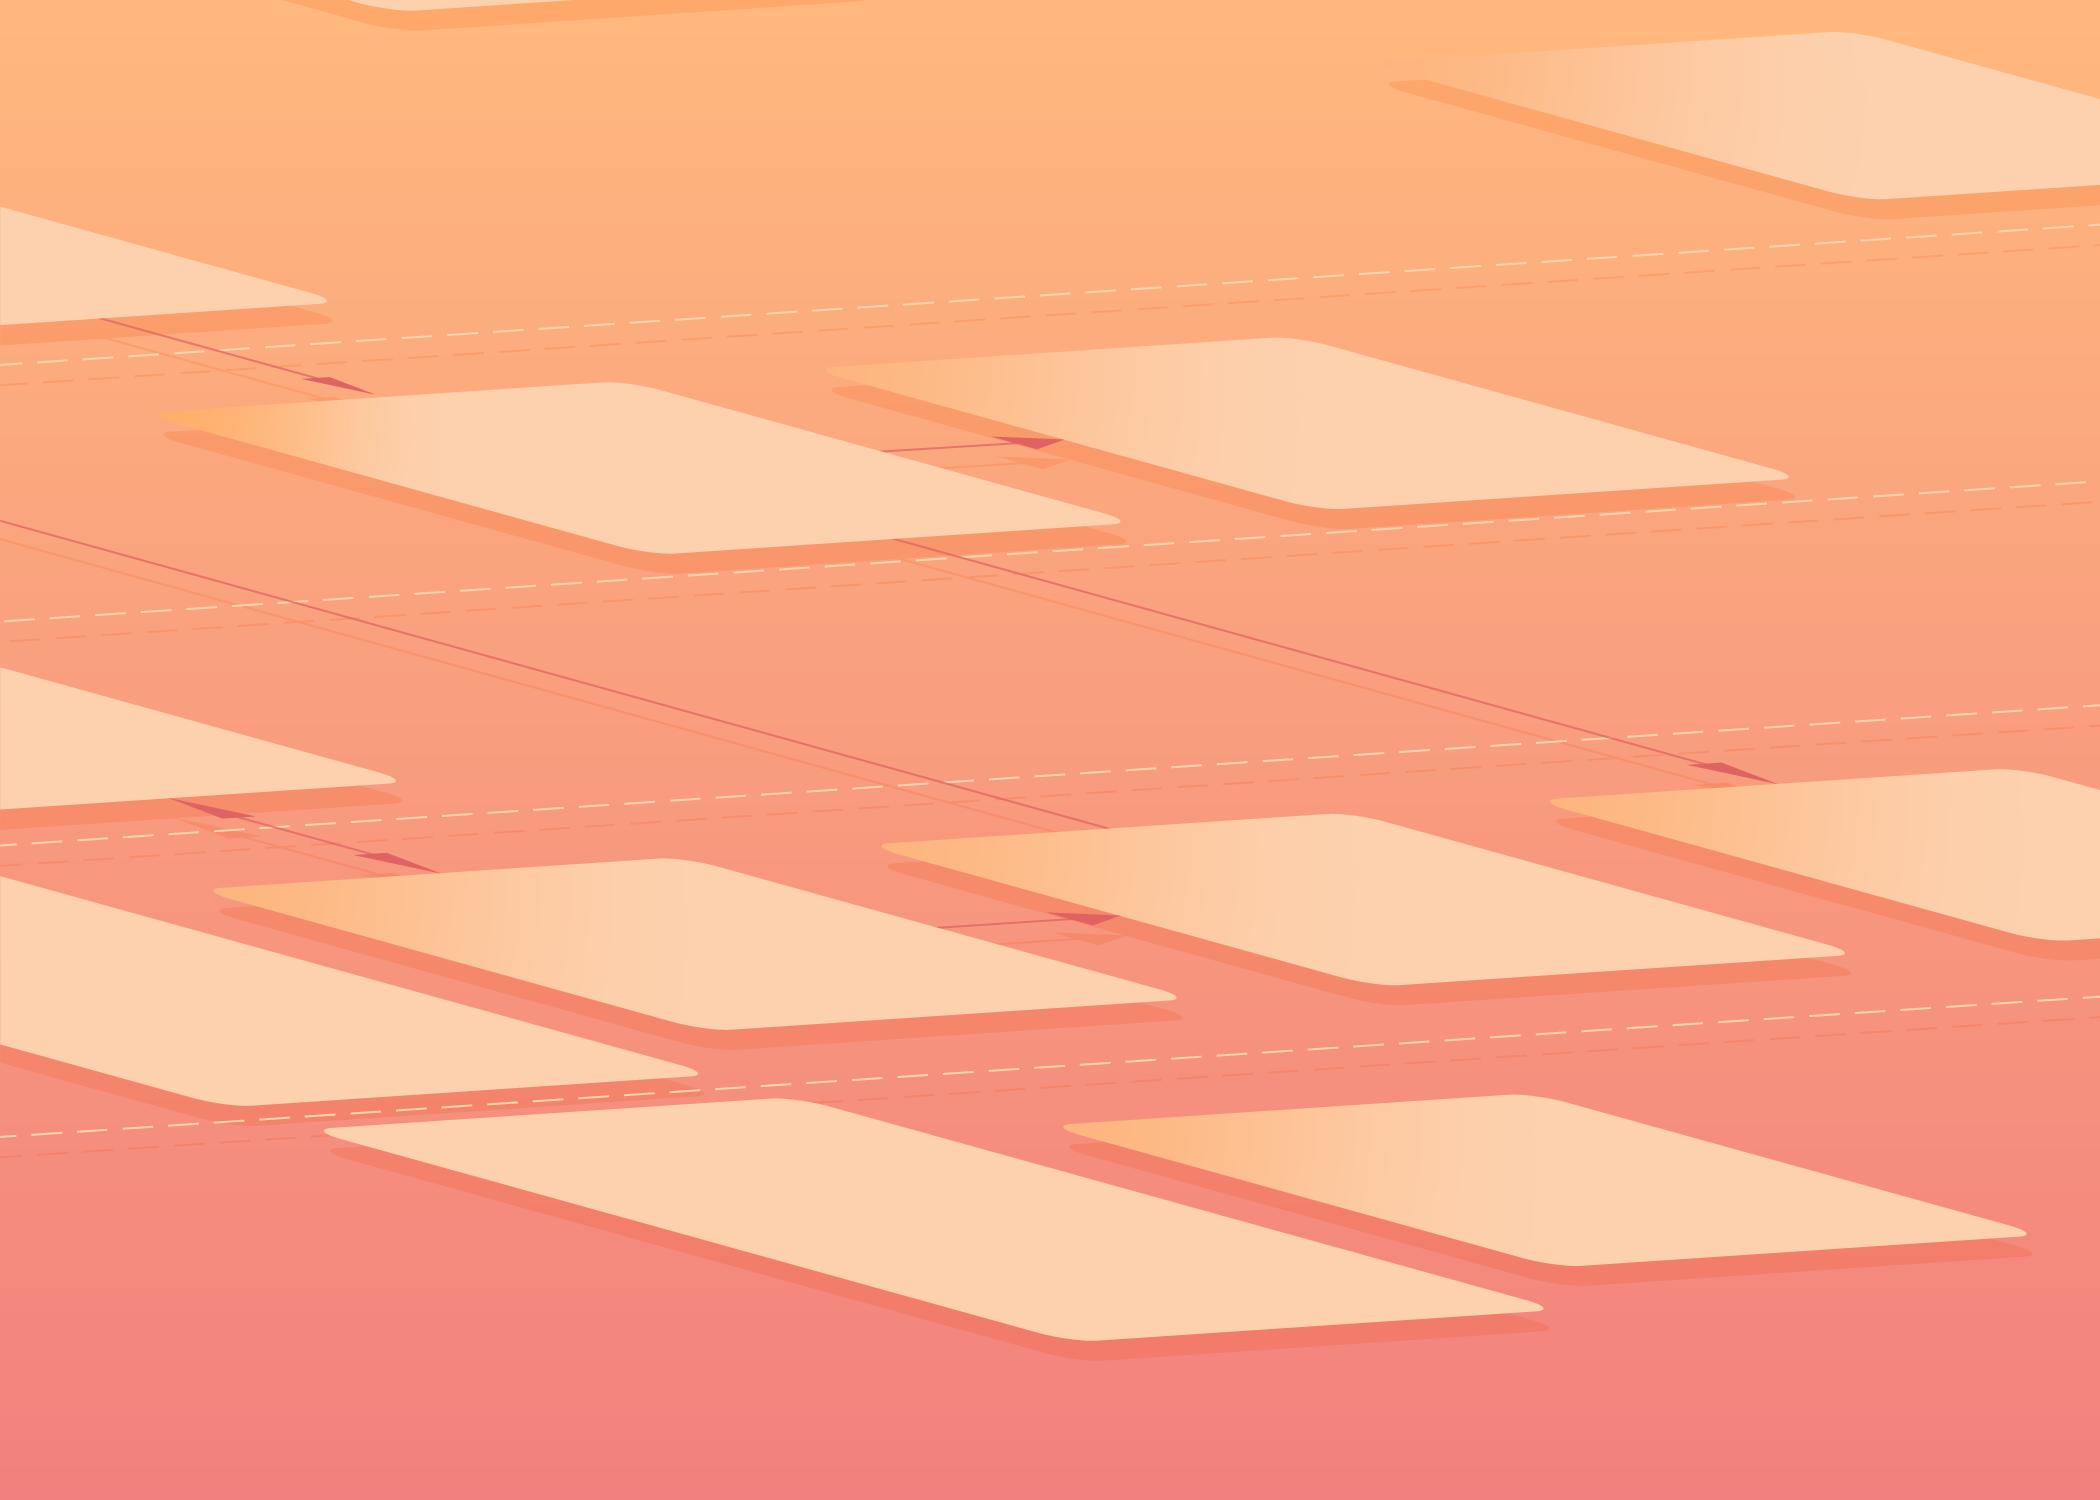 lucidchart для проектирования баз данных